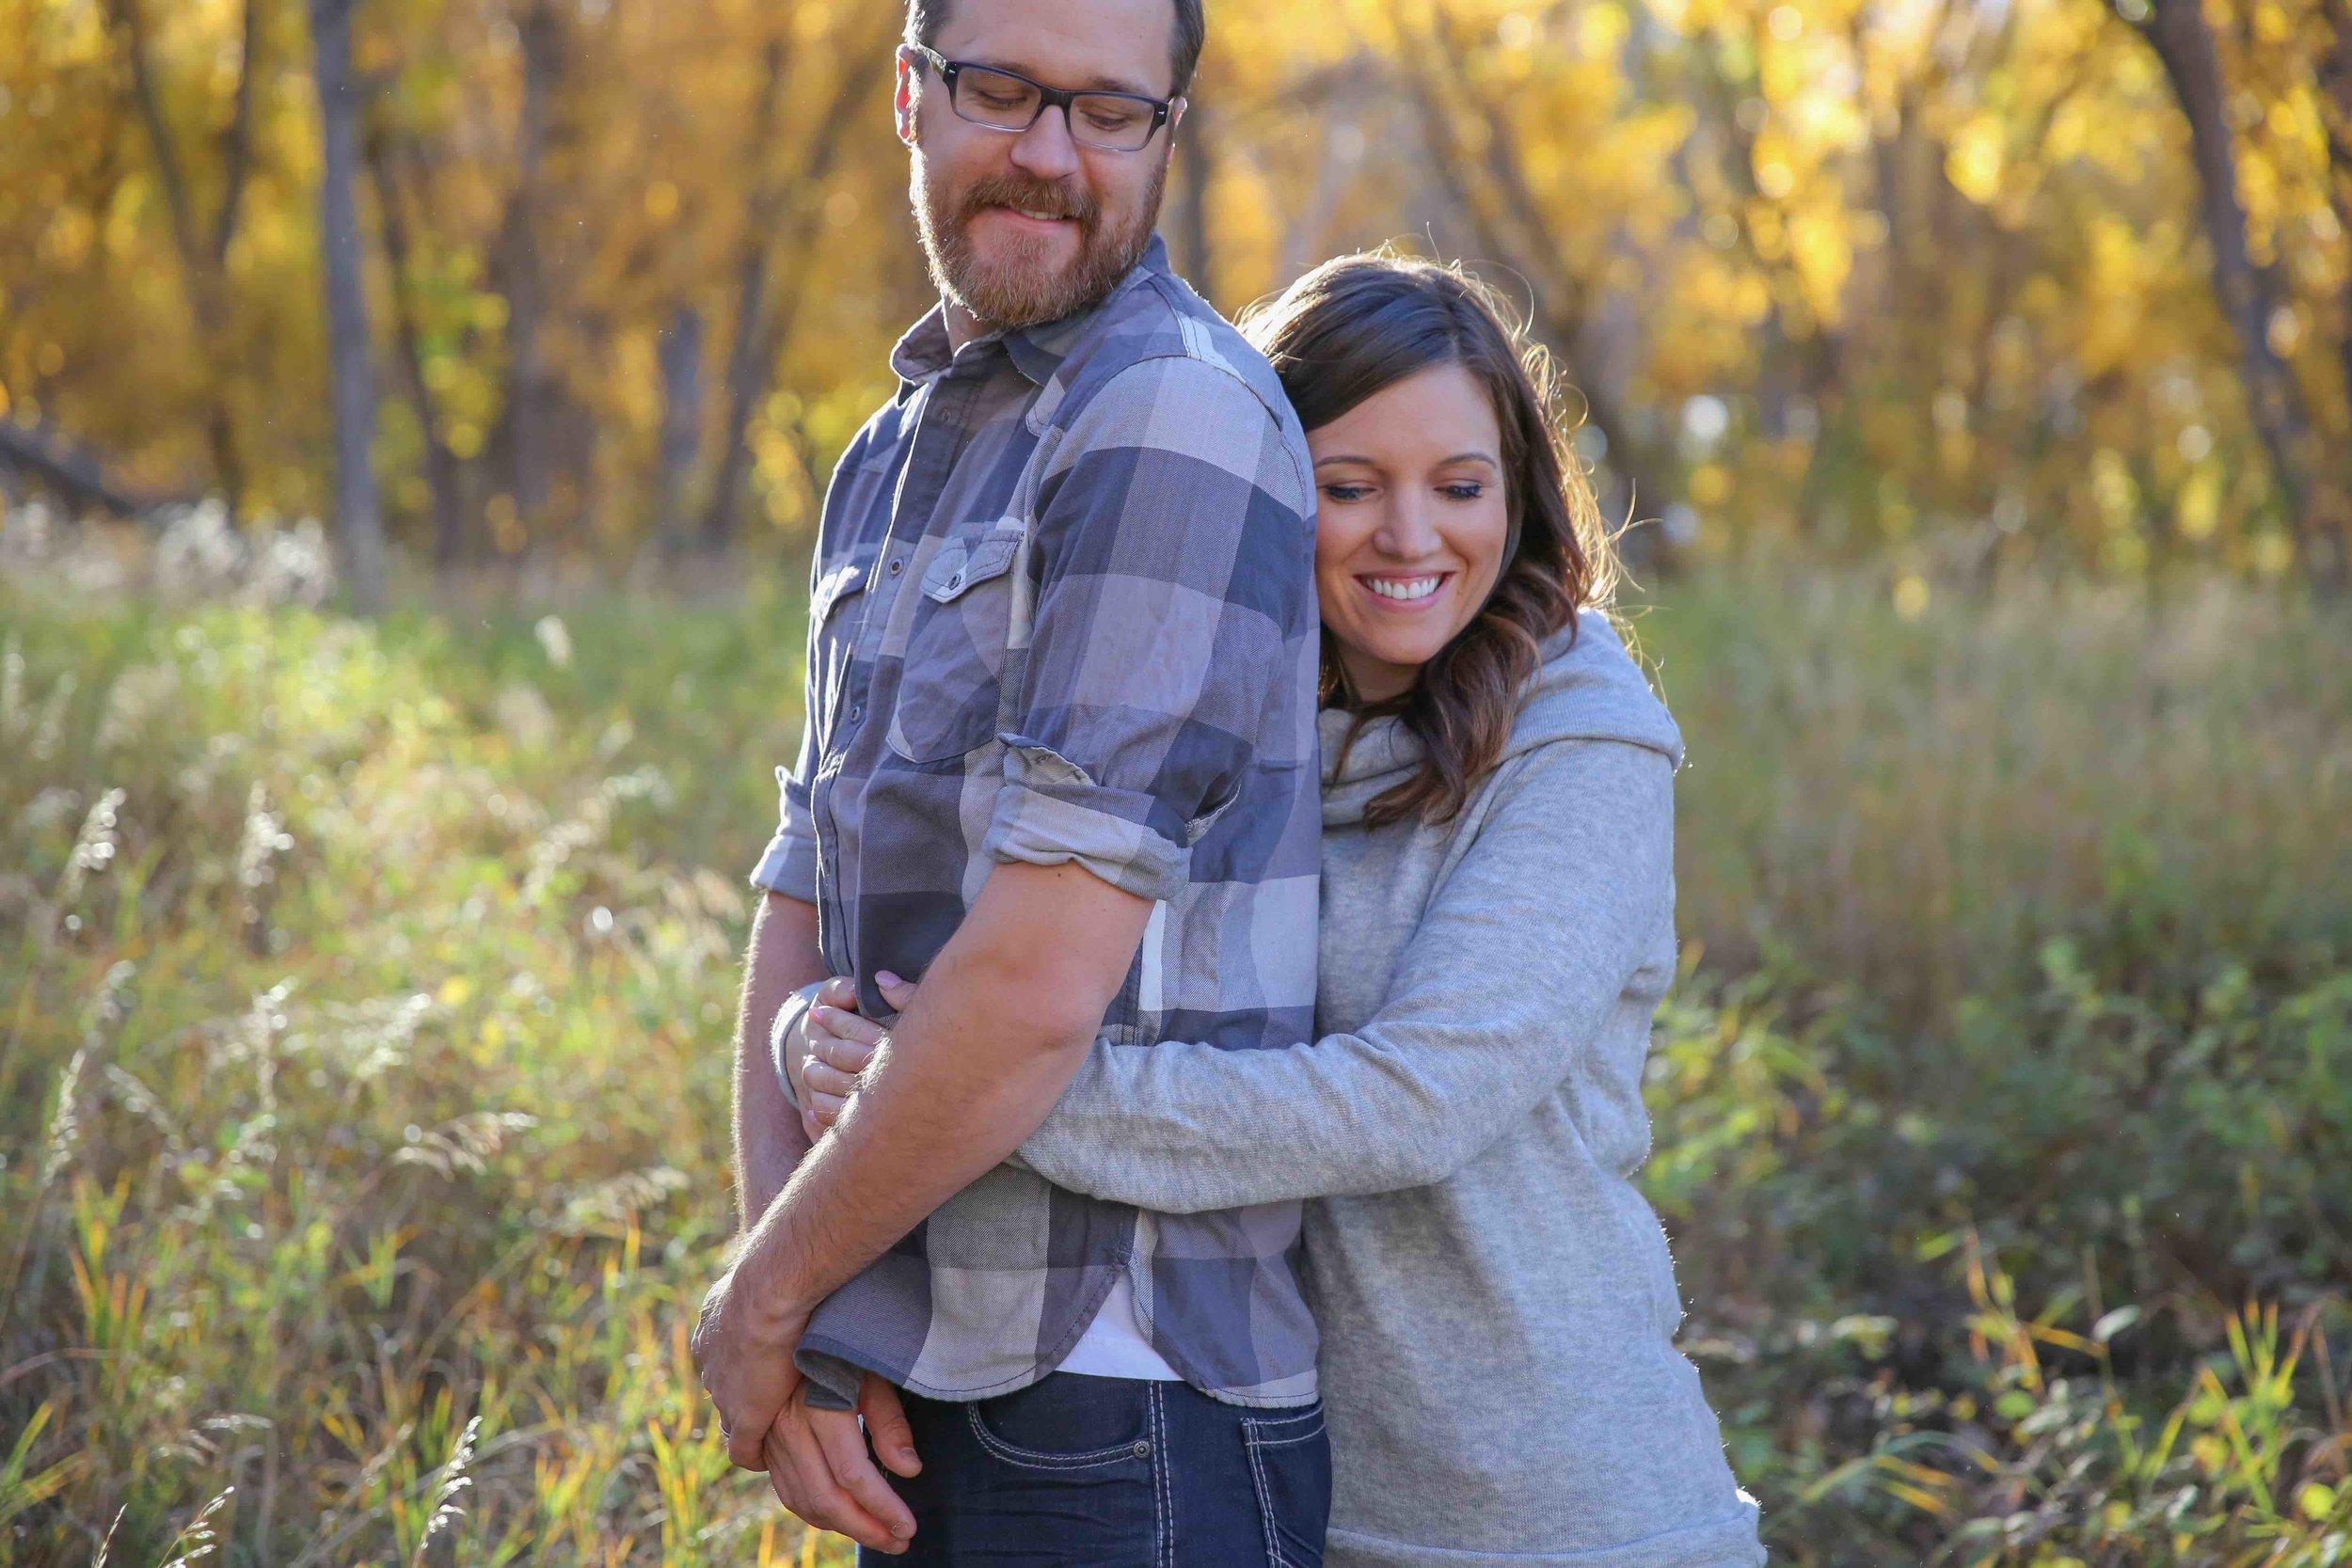 _chatfieldreseroir_coloradoengagementphotographer_www.kisaconrad.com_607A8016.jpeg